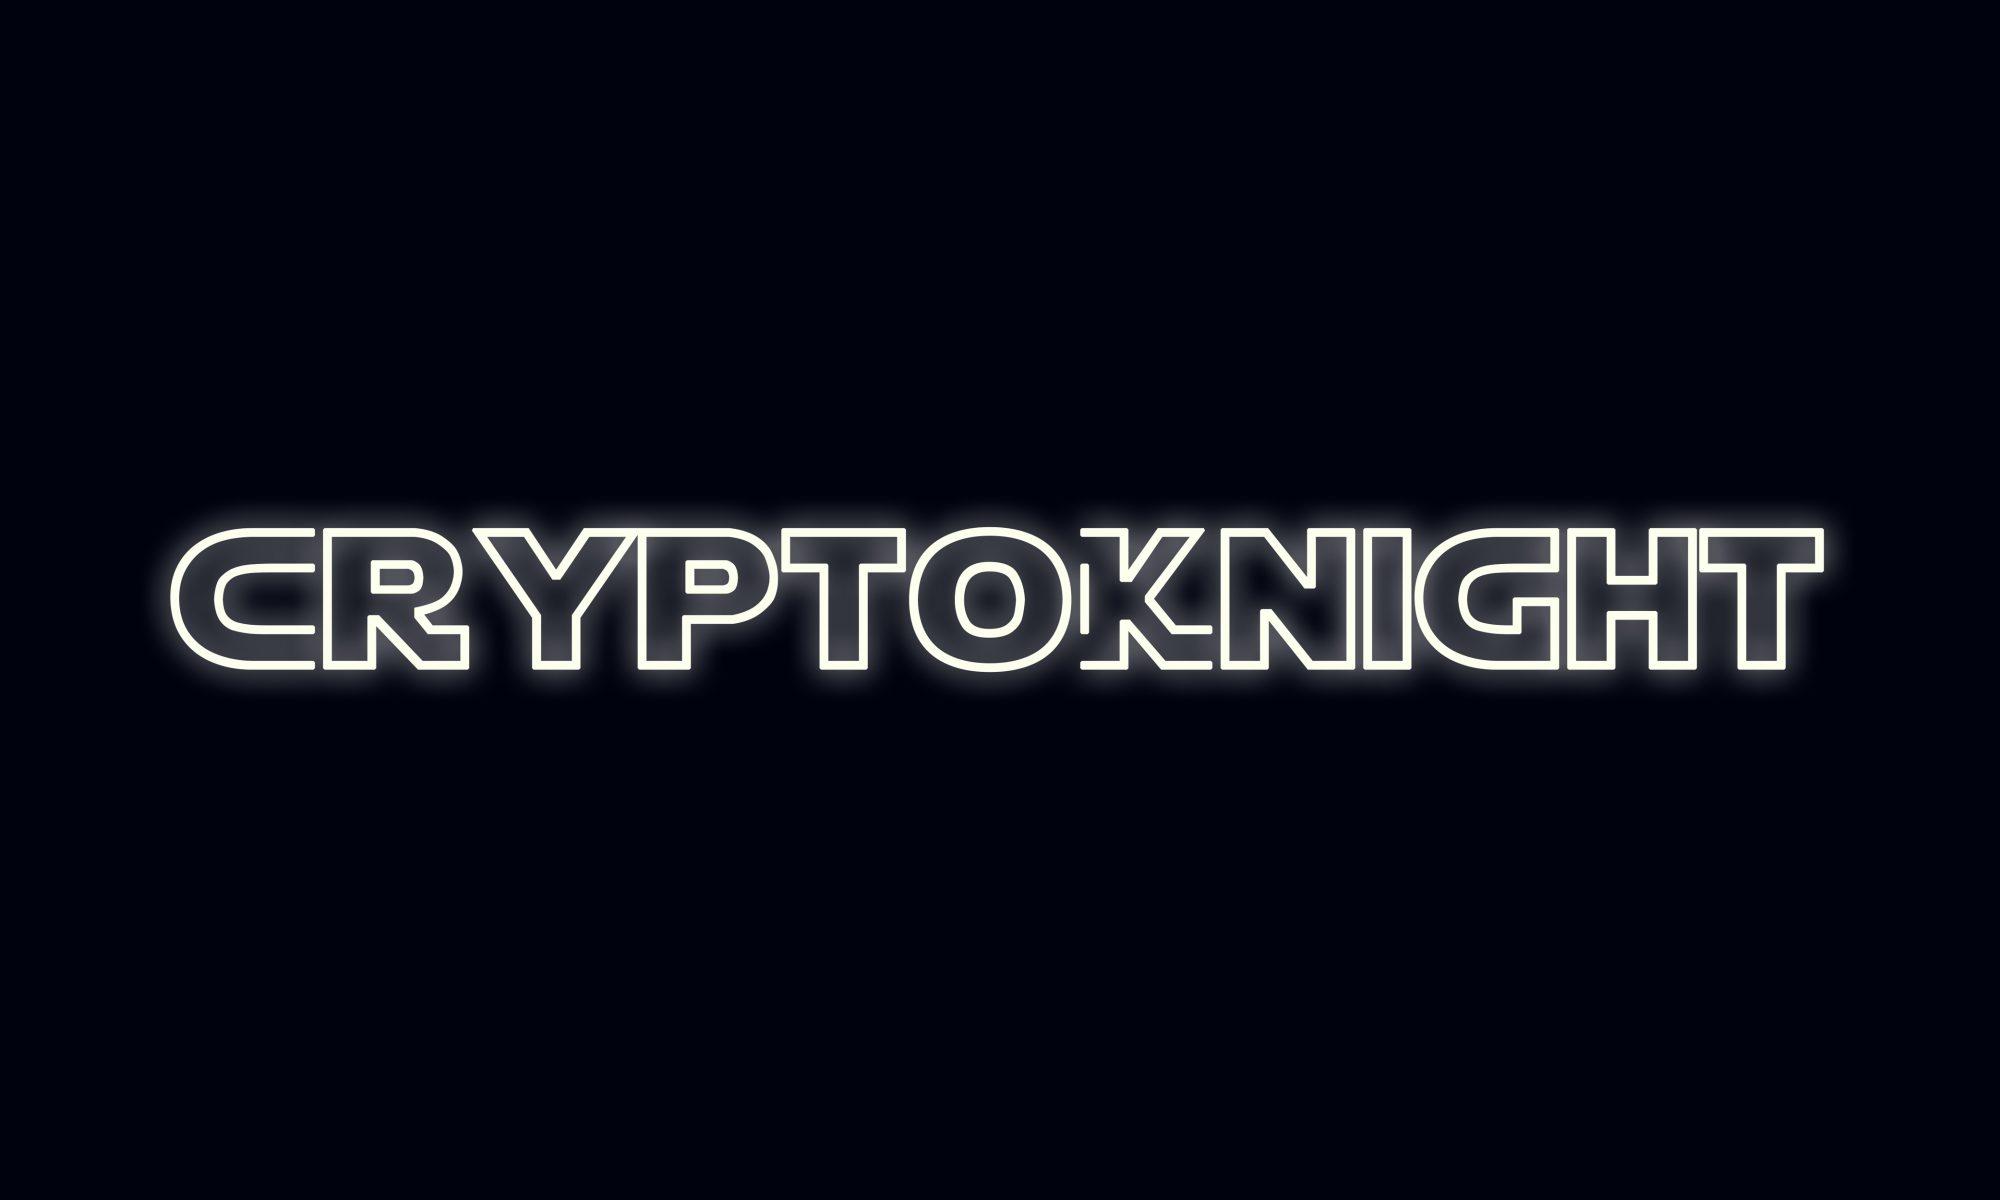 CryptoKnight